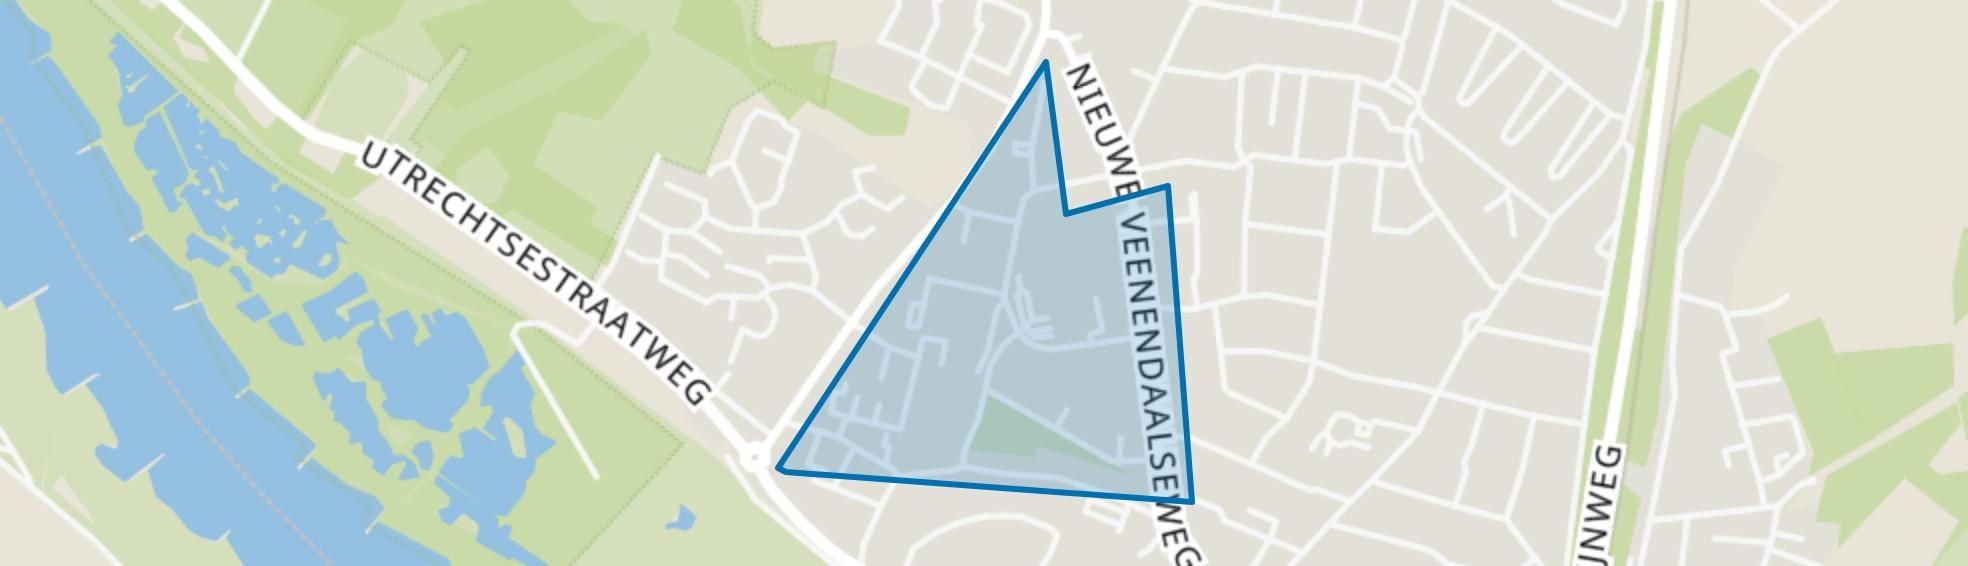 Molenberg, Rhenen map